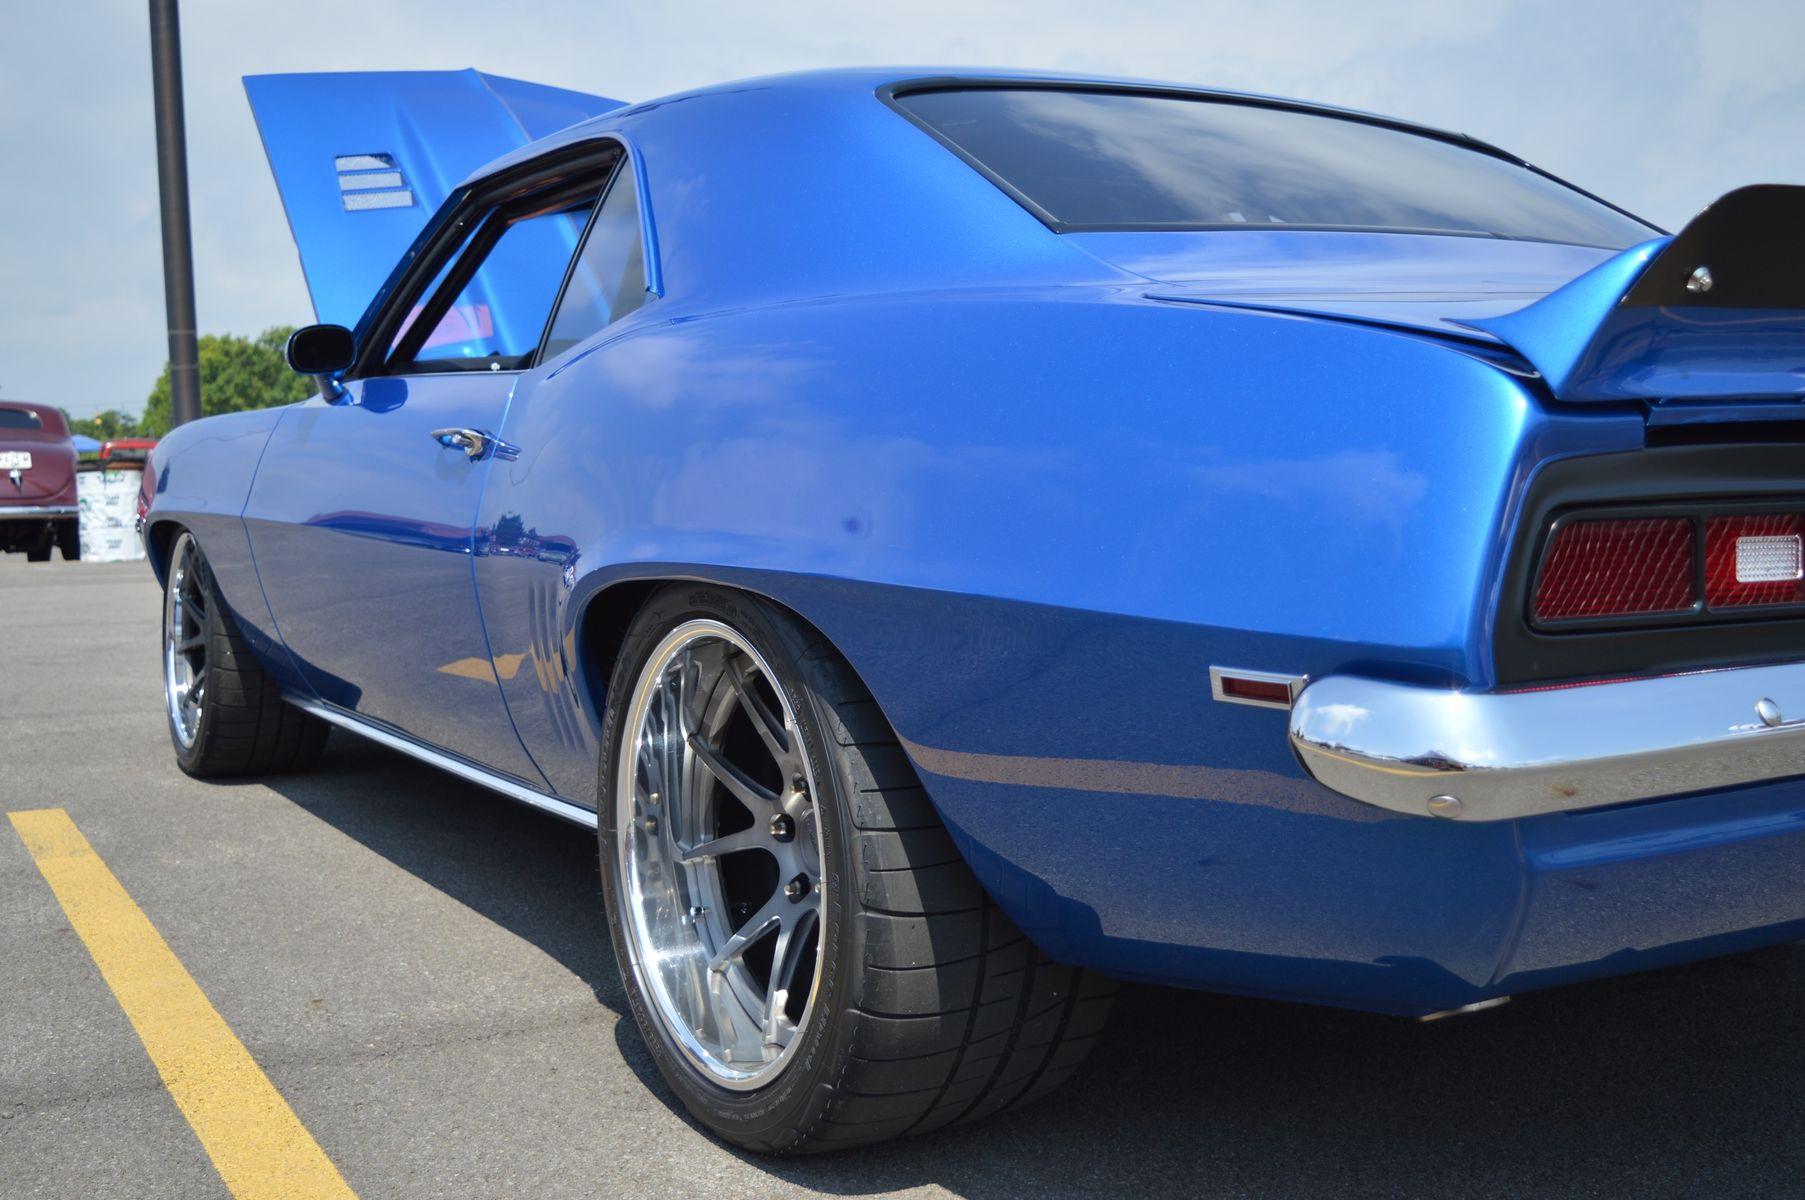 1969 Chevrolet Camaro | Jason Mitchell's '69 Camaro on Forgeline GA3C Concave Wheels Wins